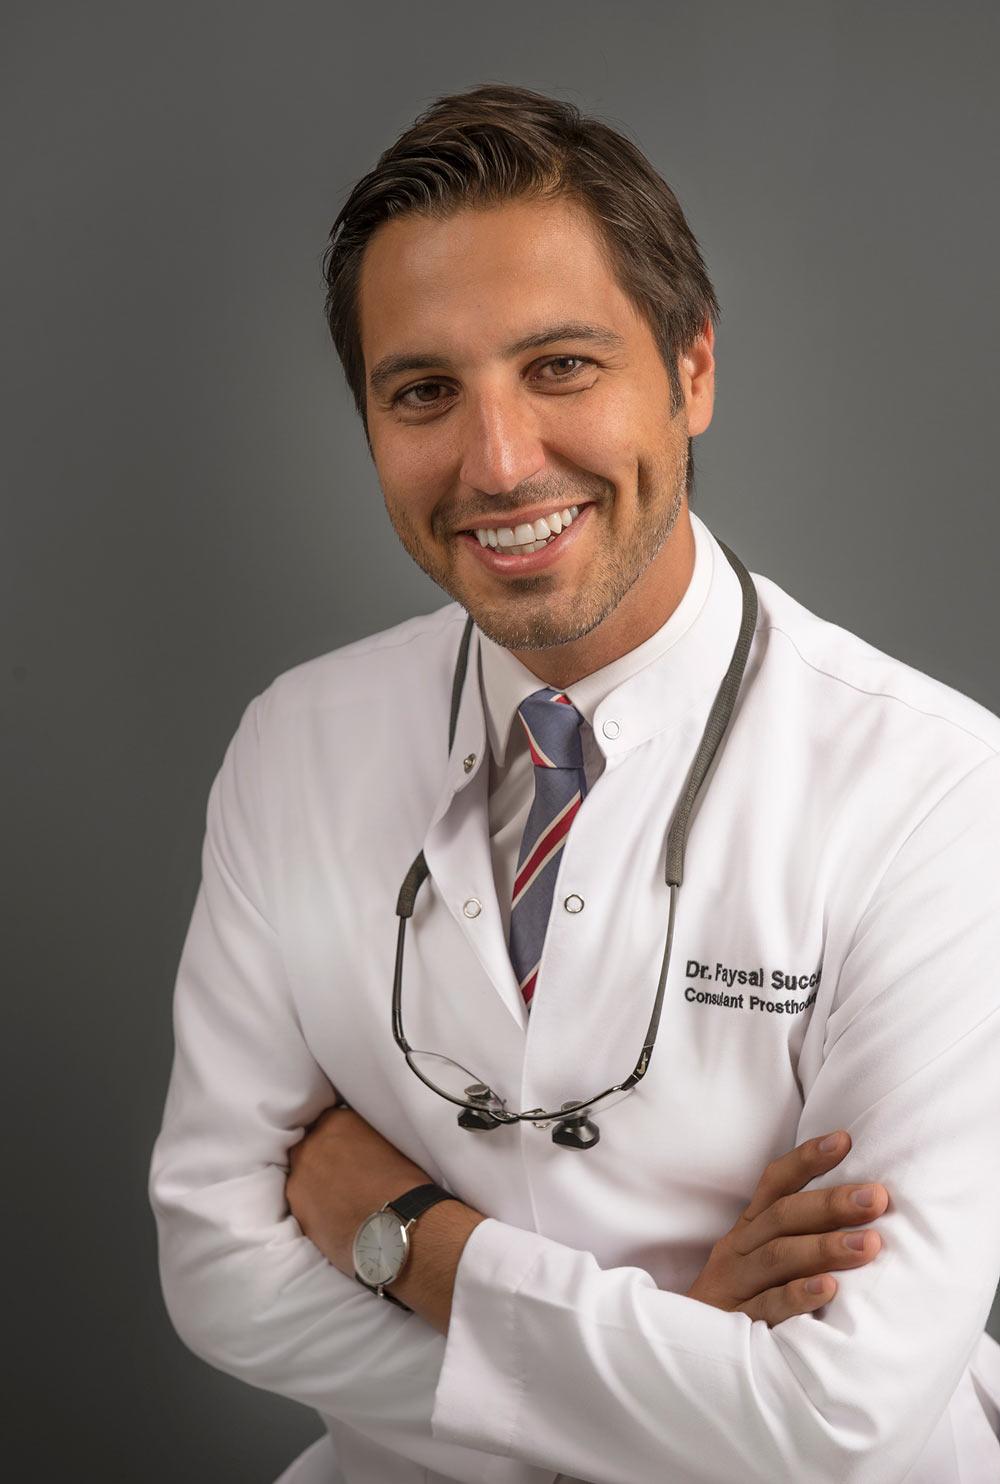 Dr. Faisal Sukkarya